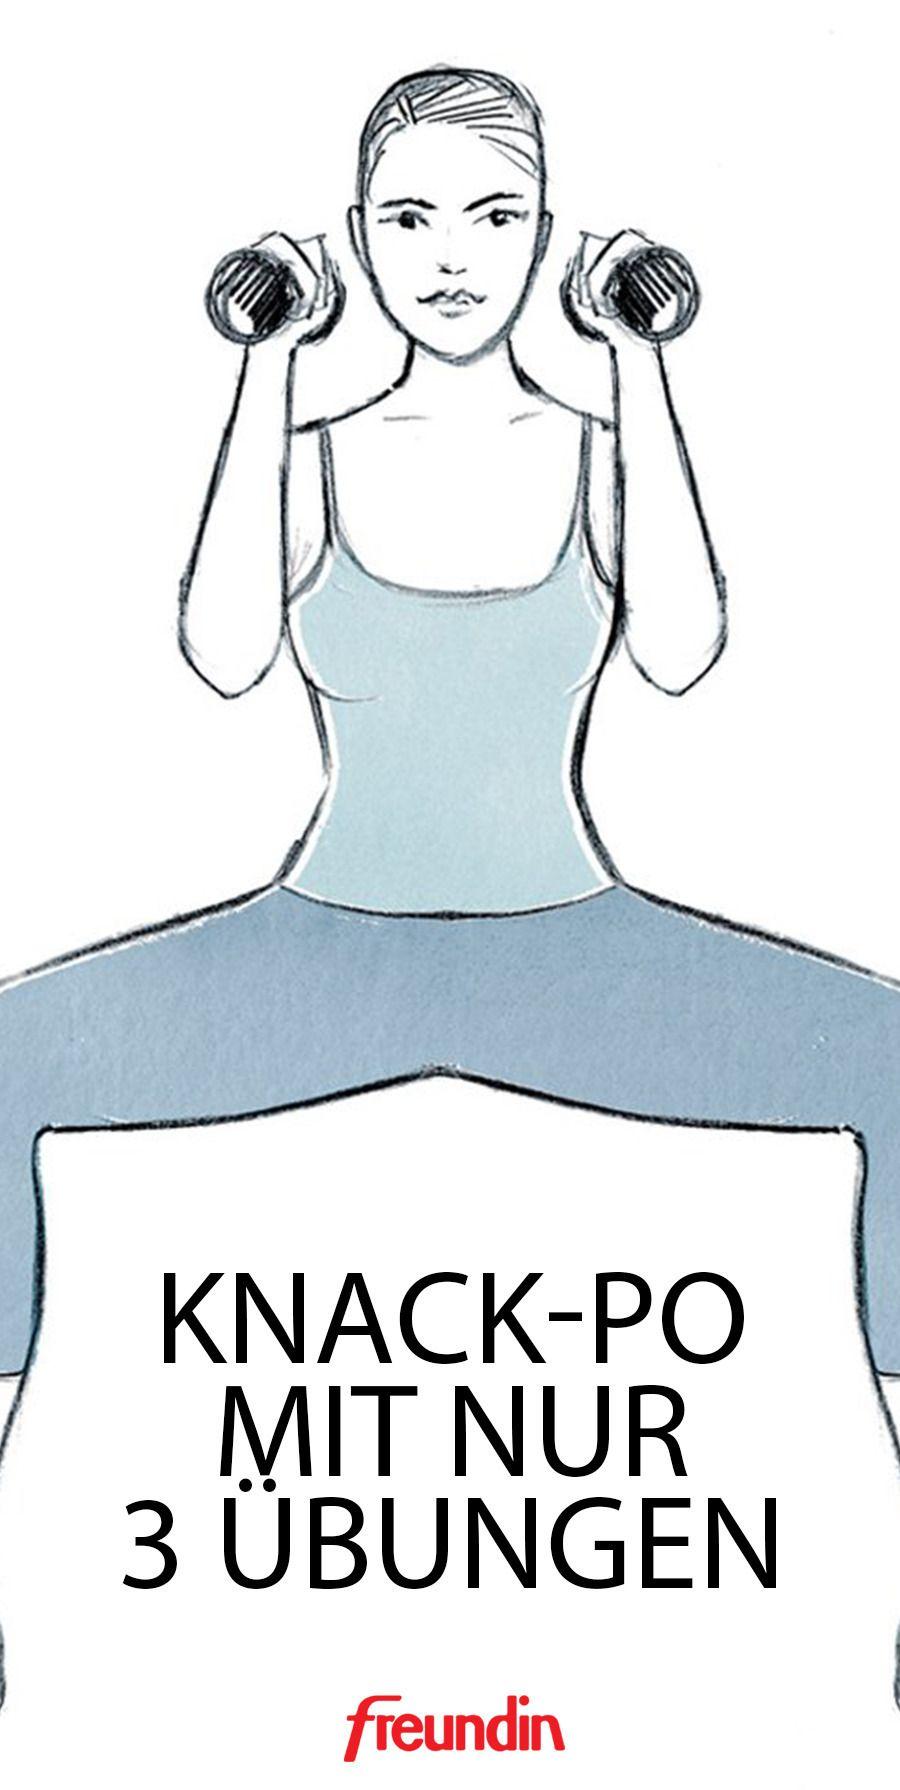 Photo of Knack-Po mit 3 Übungen | freundin.de